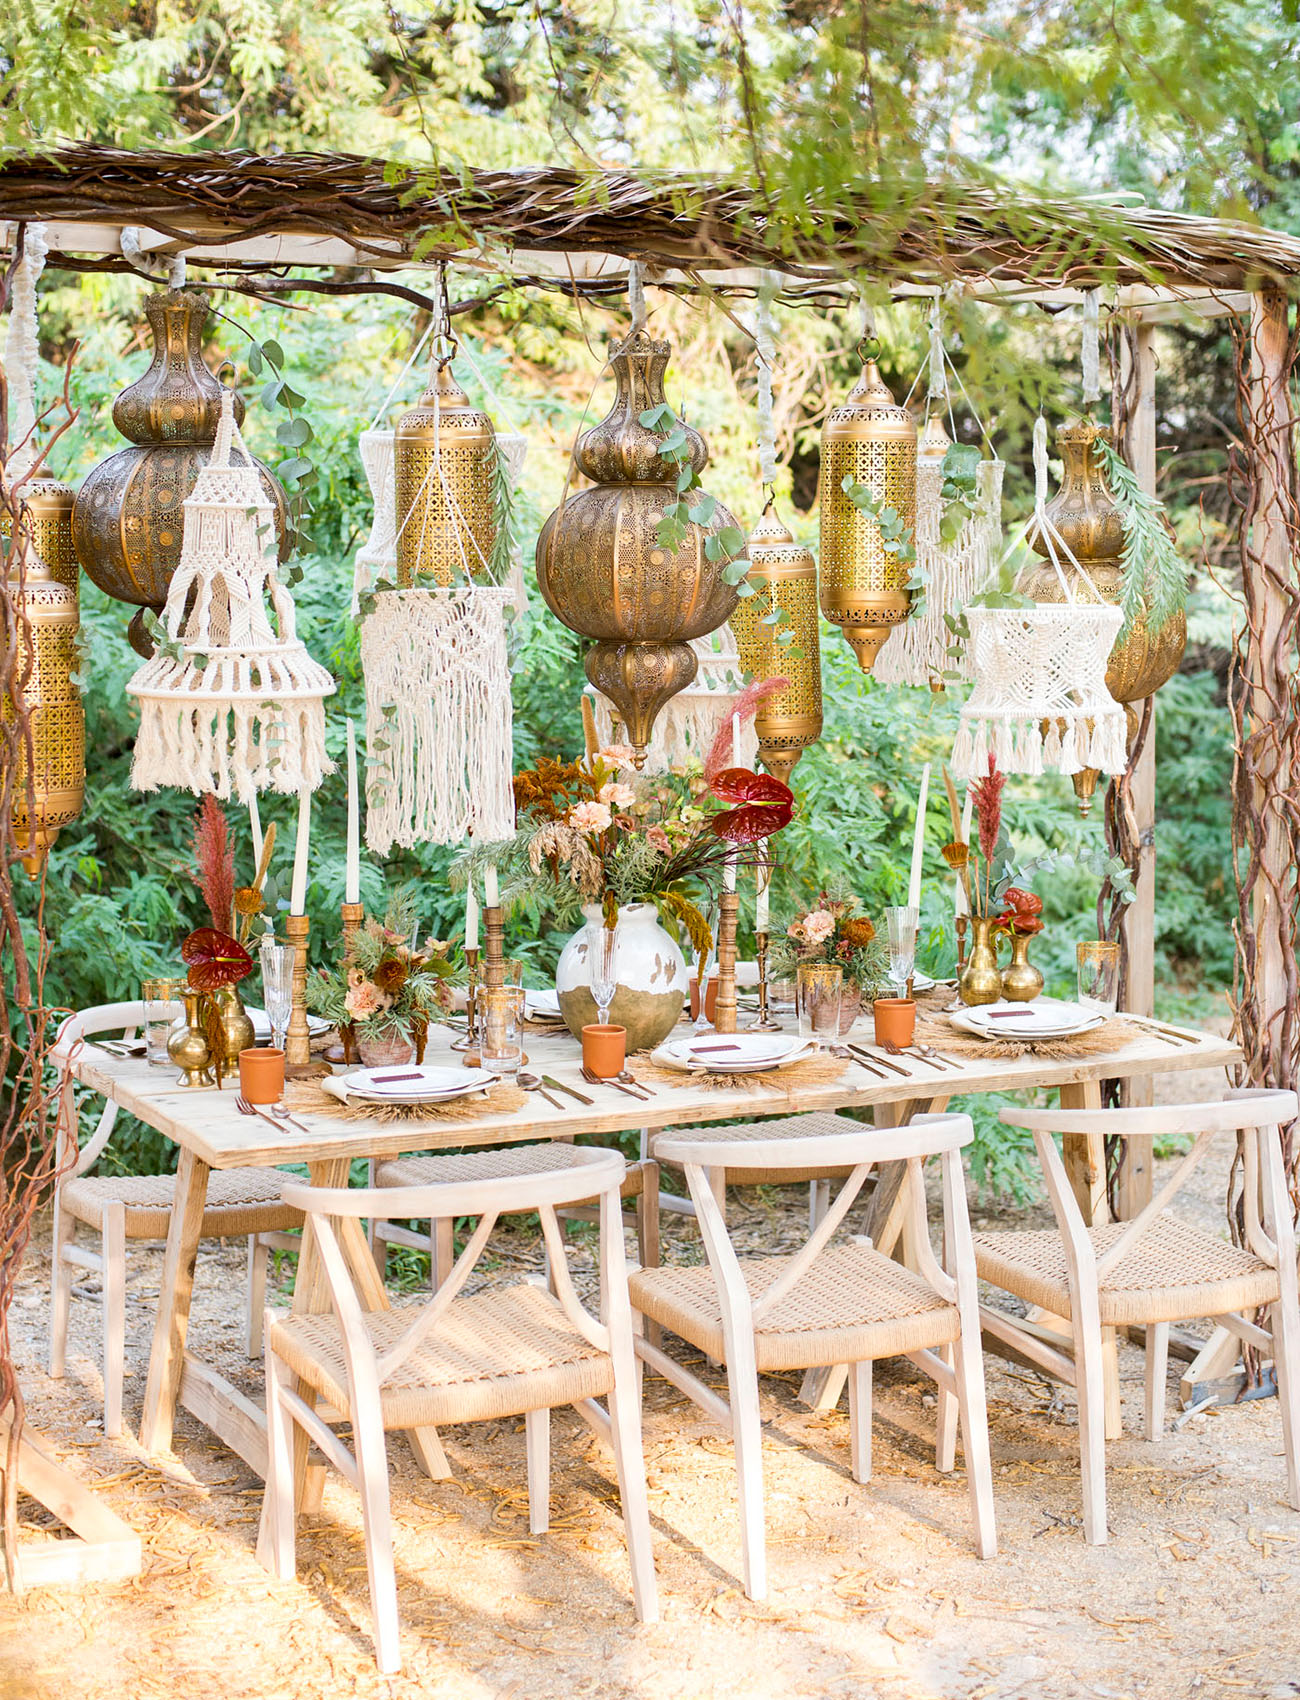 a macrame decor  works well for boho weddings